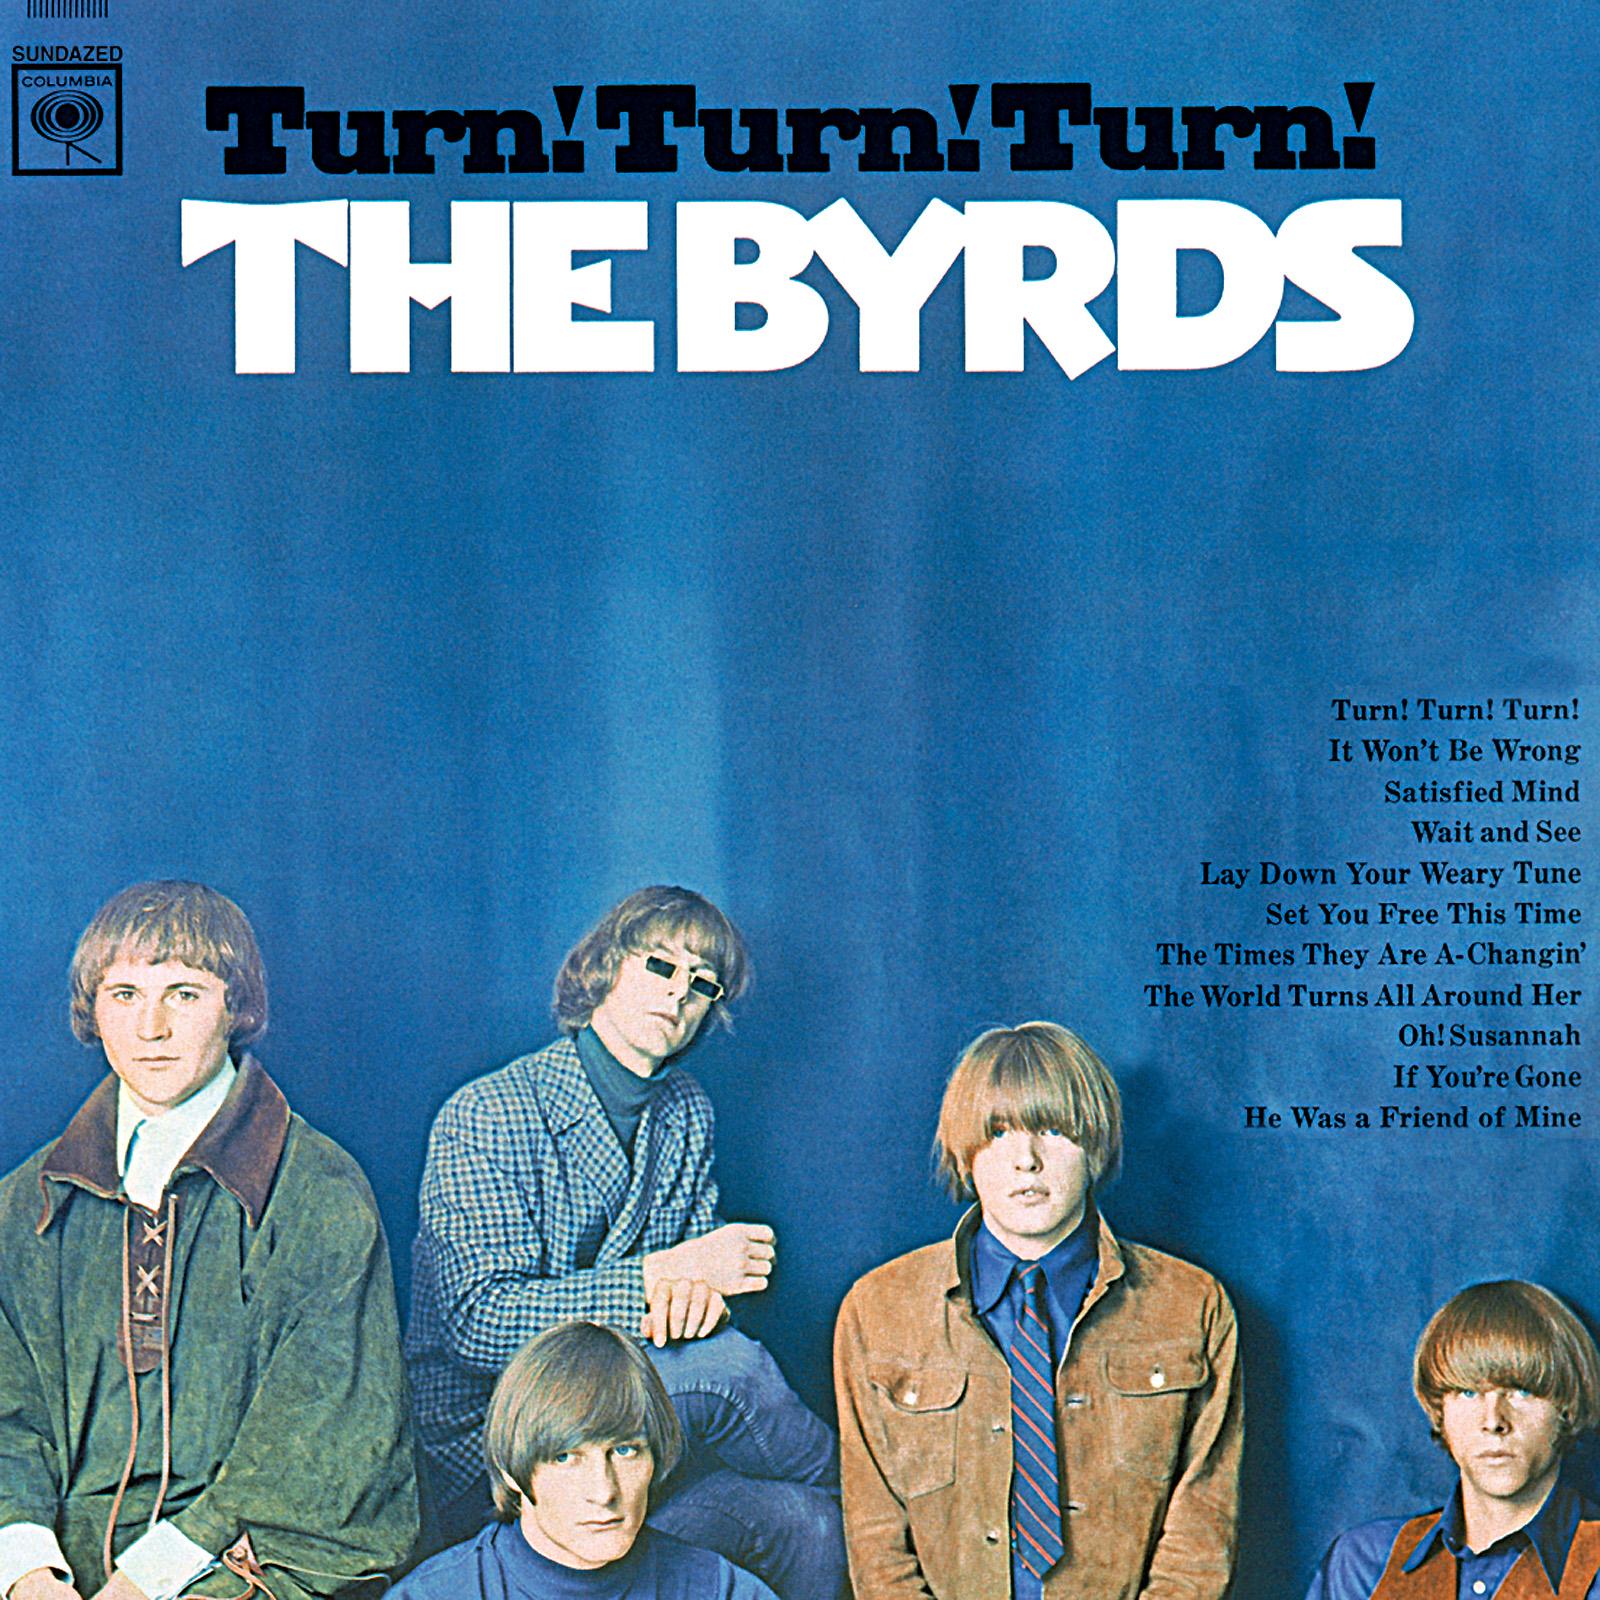 Byrds, The - Turn! Turn! Turn! MONO LP